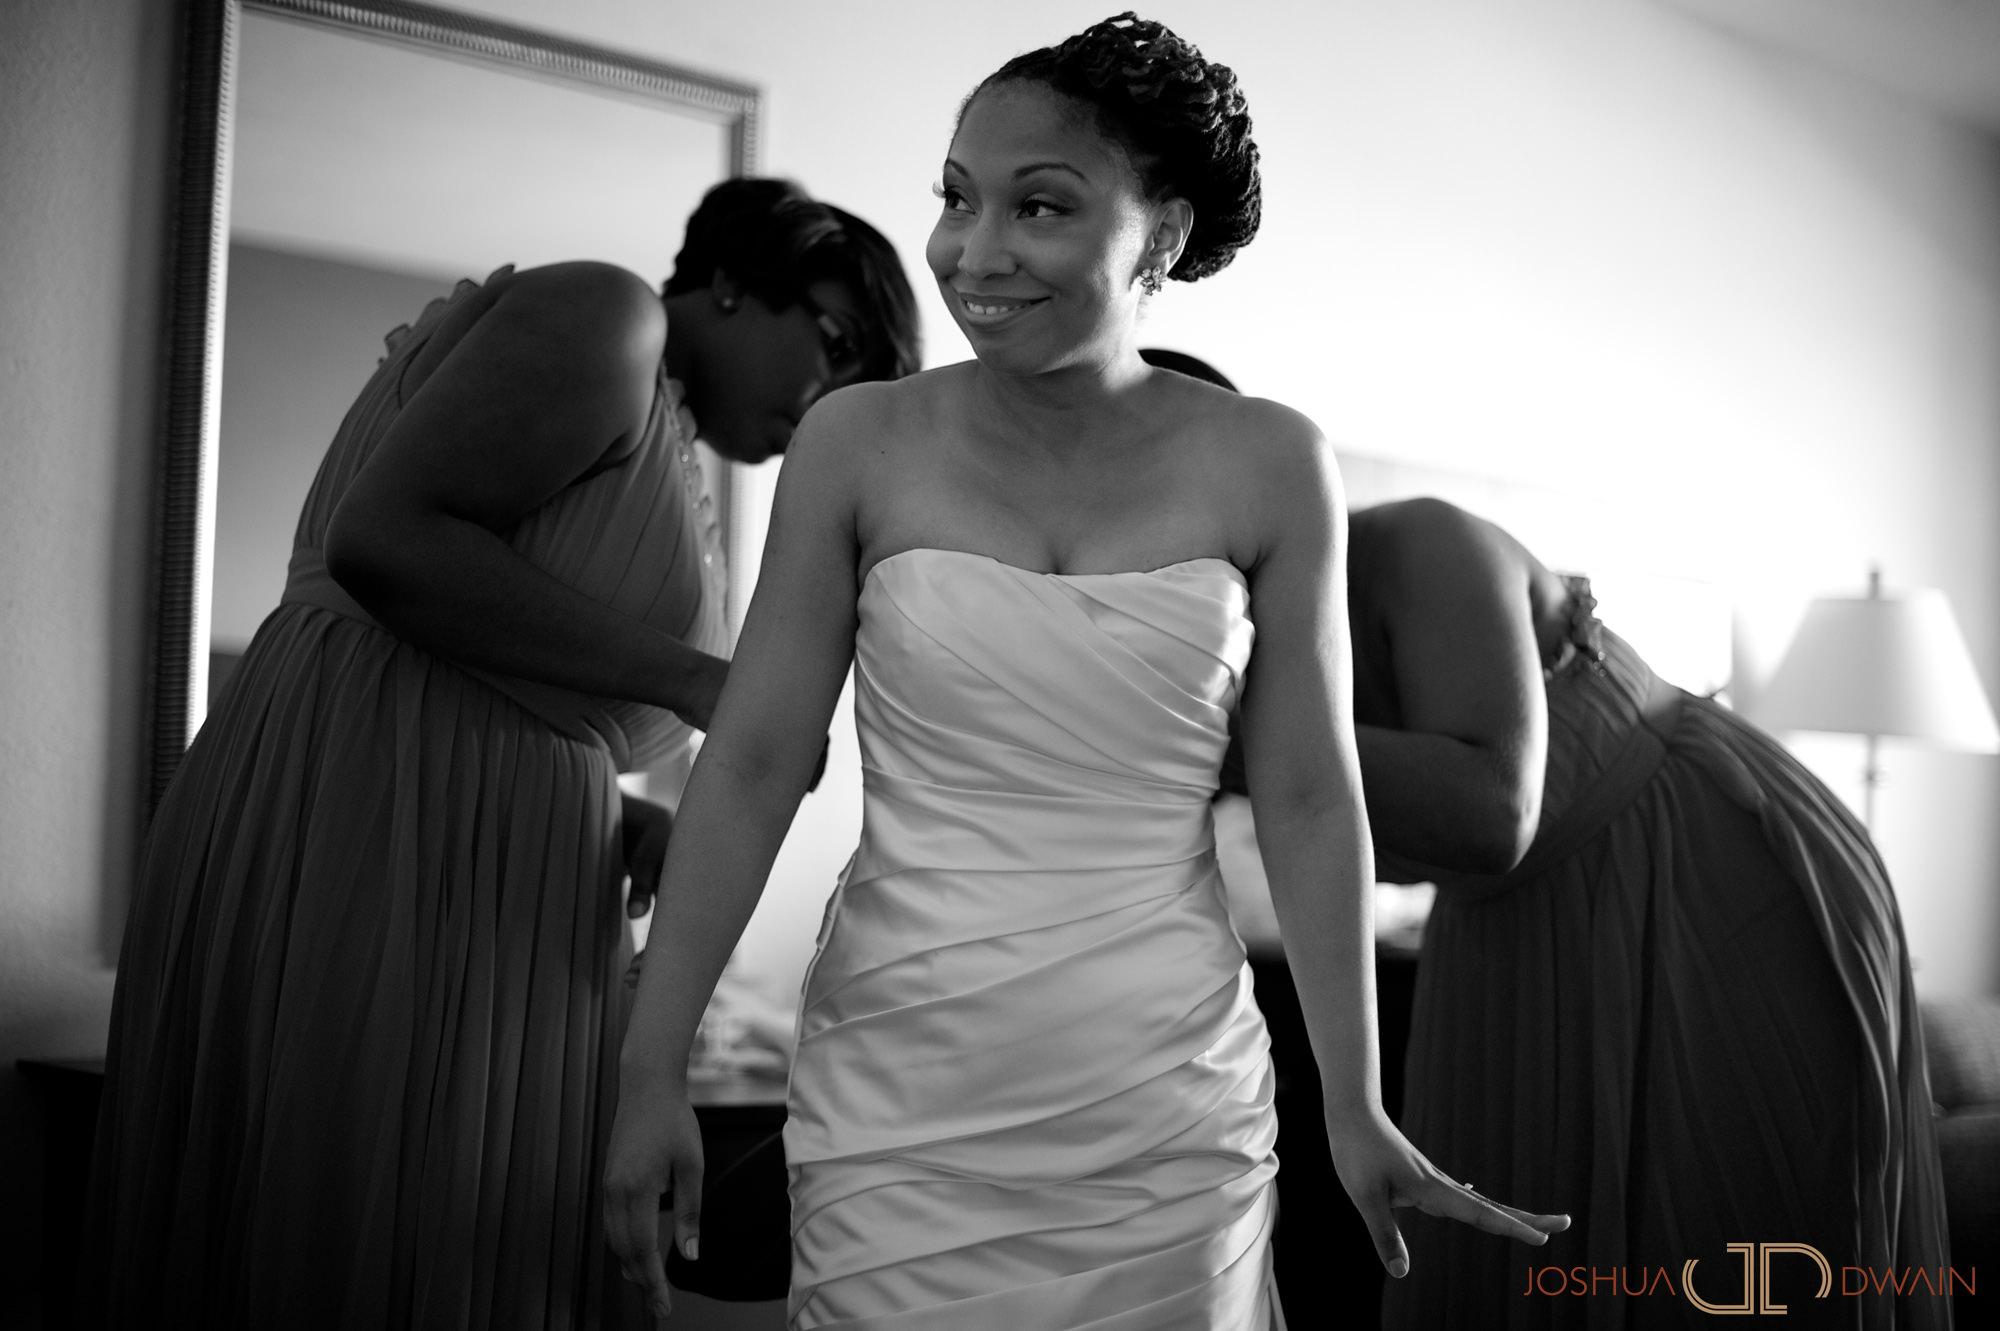 candra-alonza-004-holiday-inn-south-beach-miami-wedding-photographer-joshua-dwain-2012-07-28_ca_086